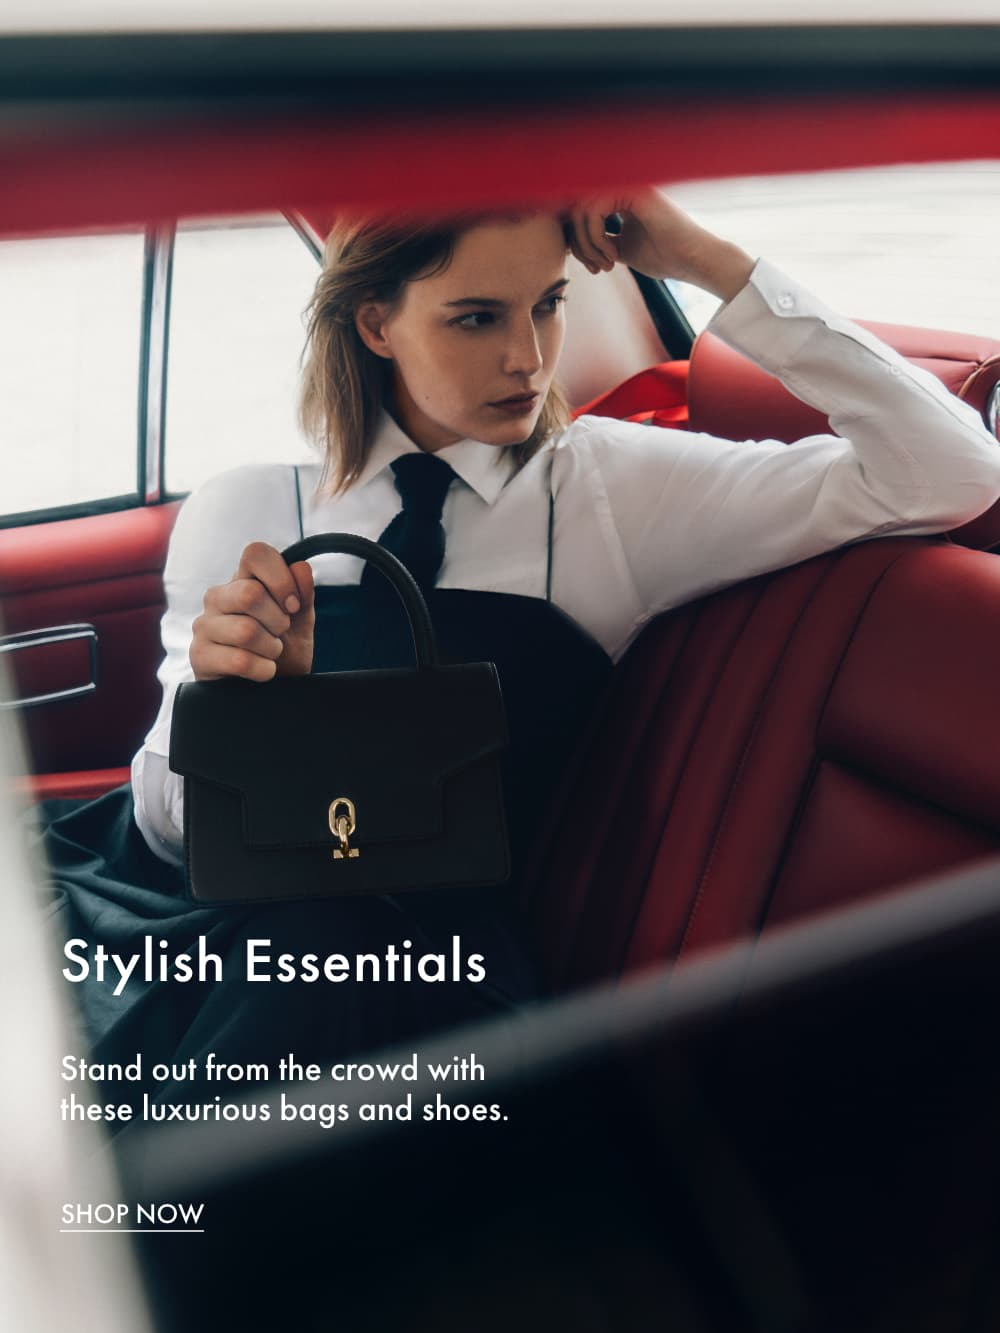 Stylish Essentials